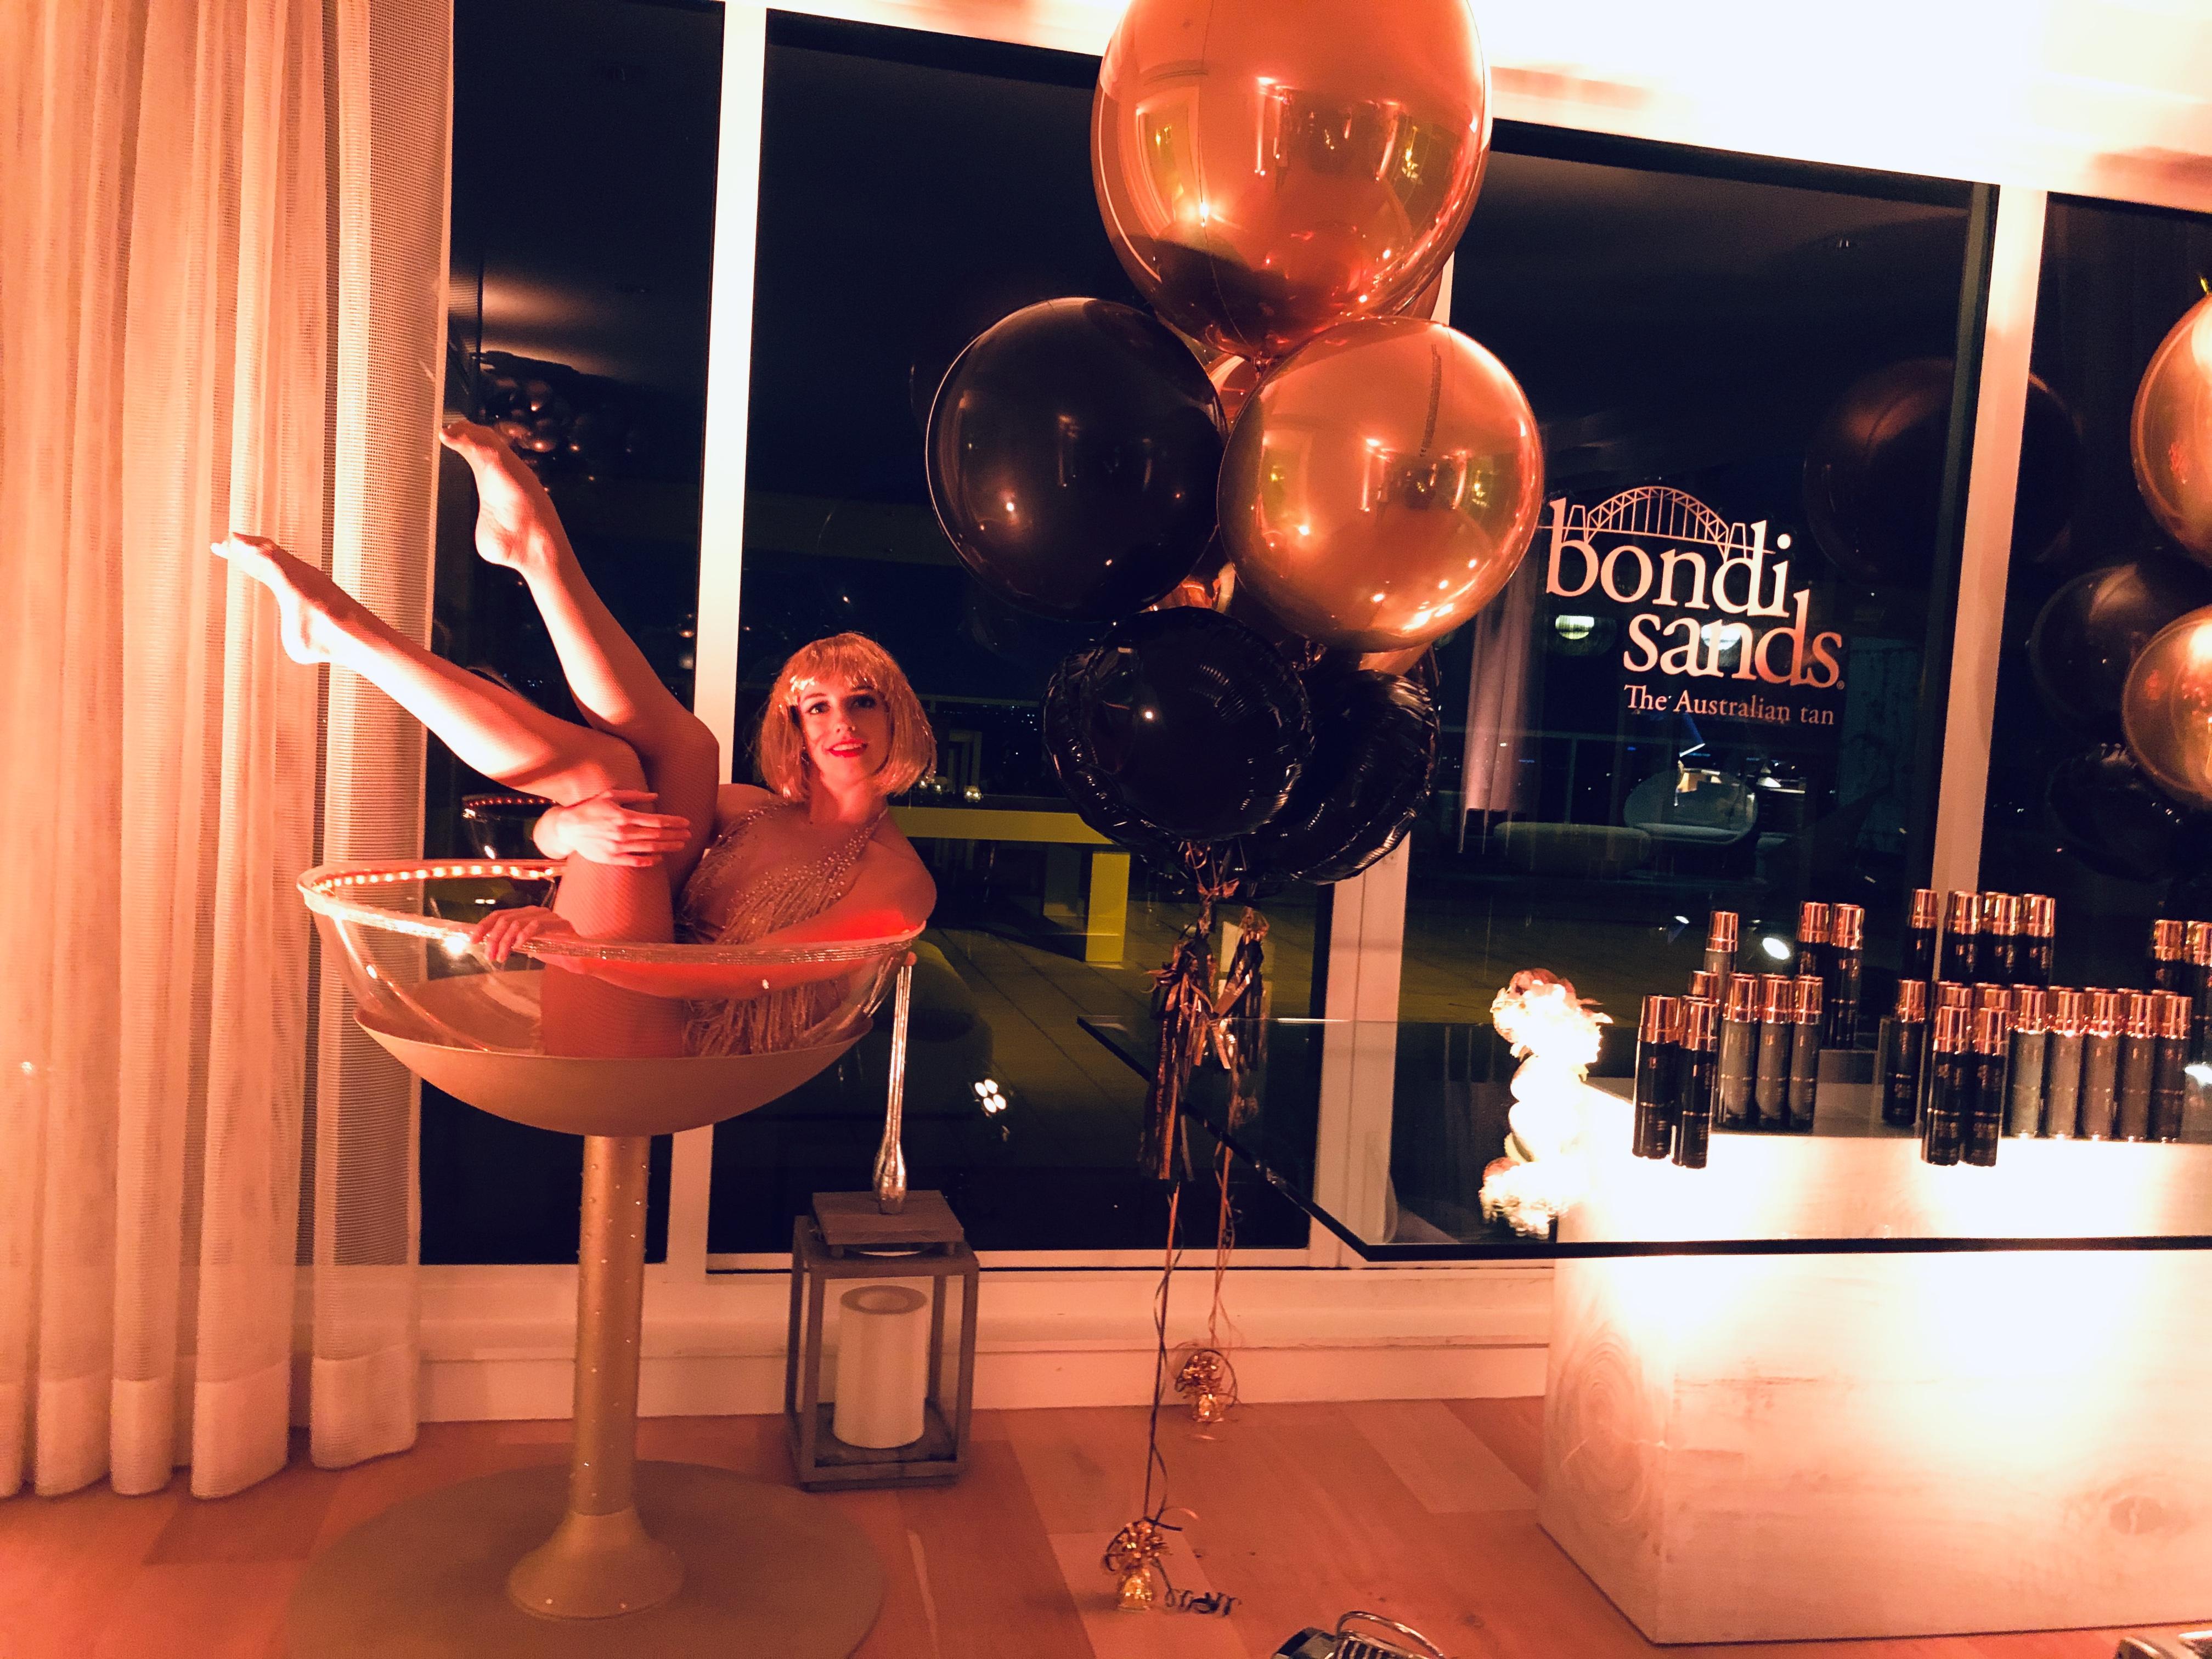 dancer in martini glass